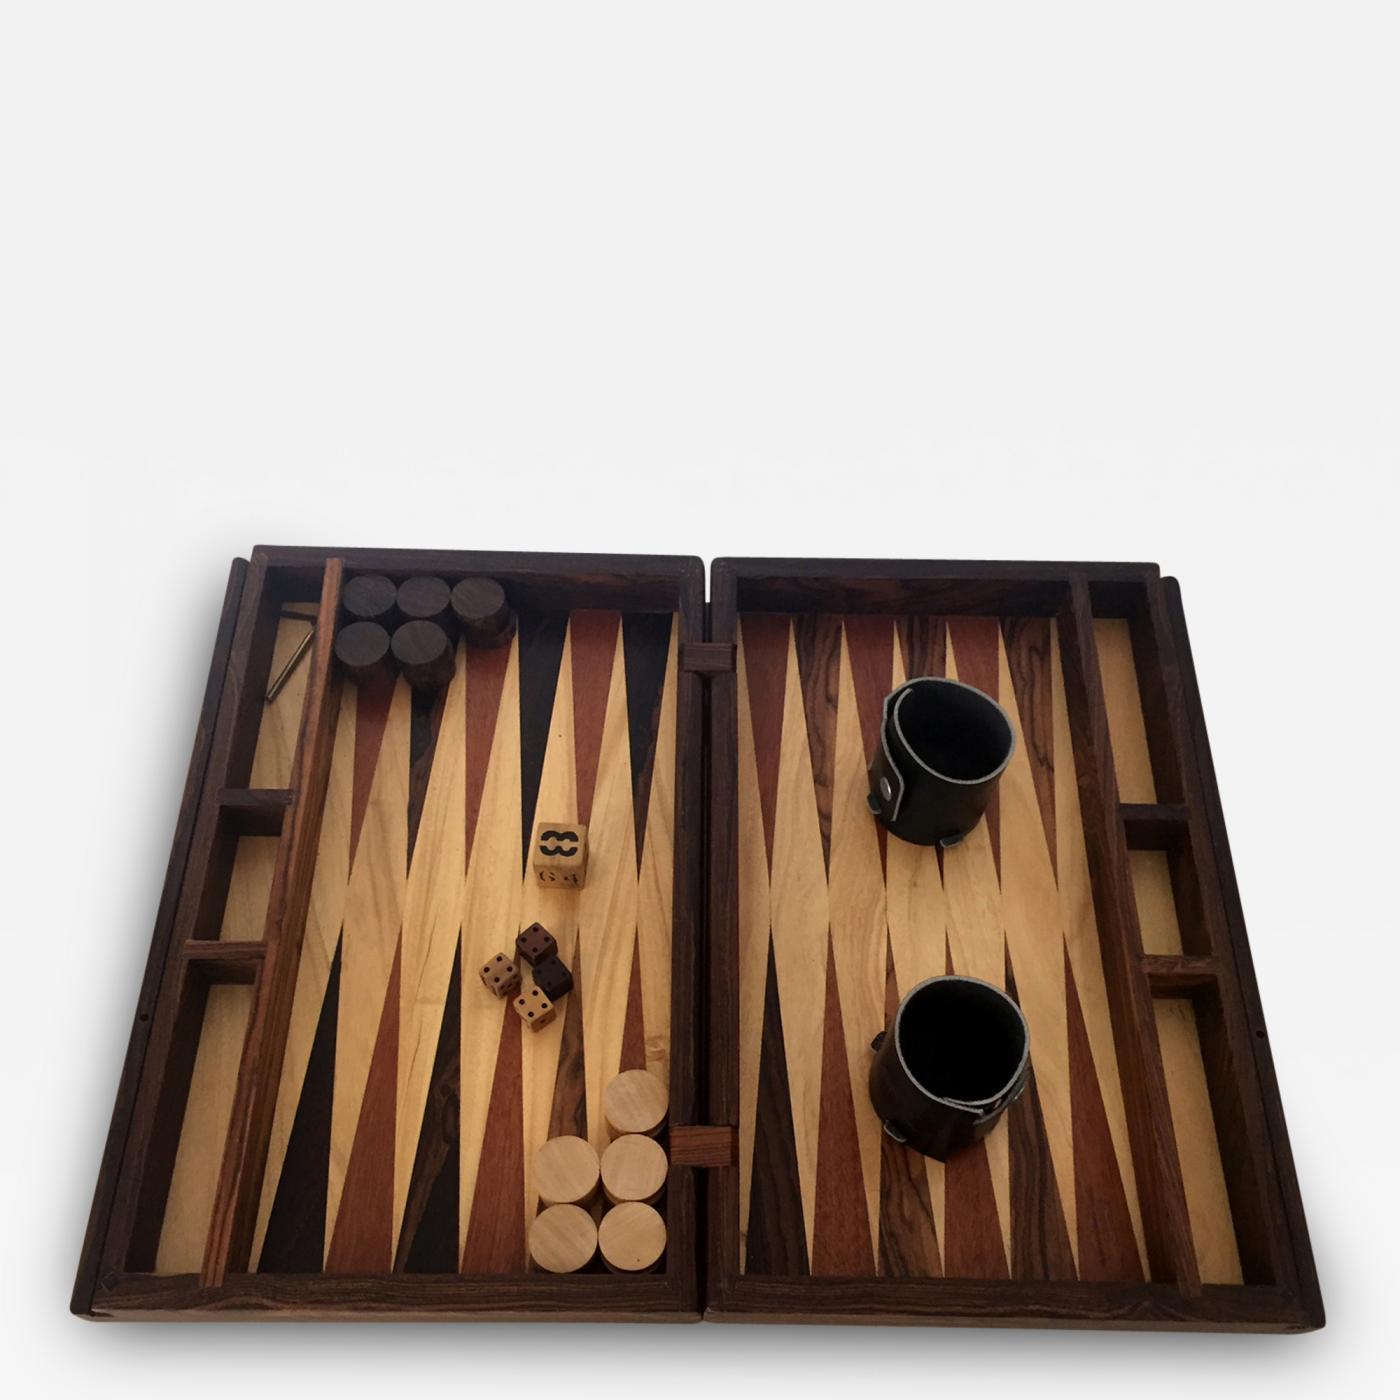 listings decorative arts decorative objects boxes u0026 baskets don s shoemaker handmade backgammon game - Backgammon Game